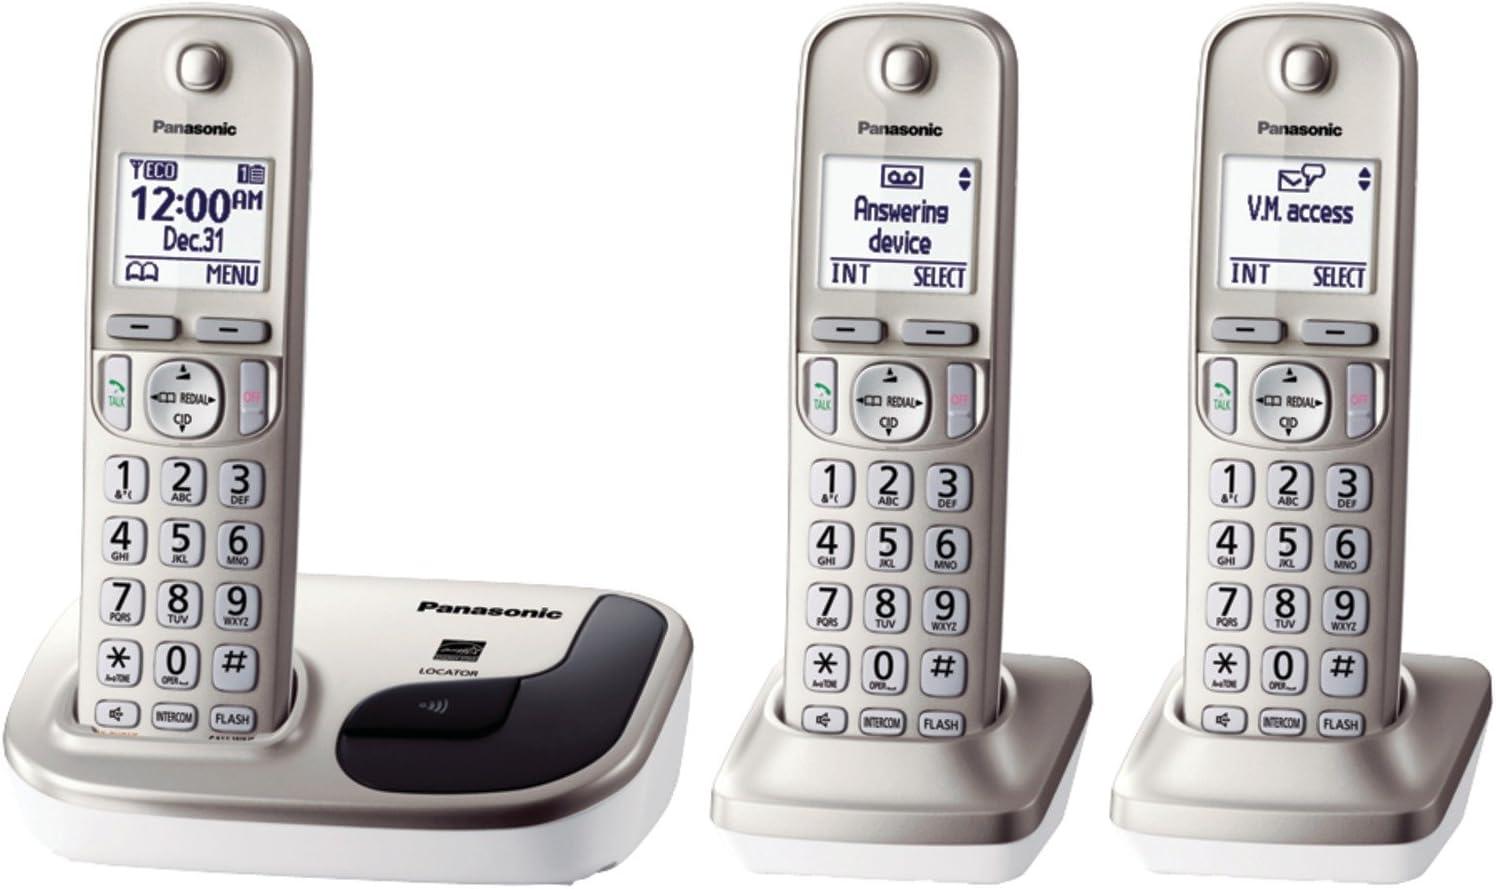 Panasonic Expandable Digital Cordless Phone con 1 Terminal: Amazon.es: Electrónica